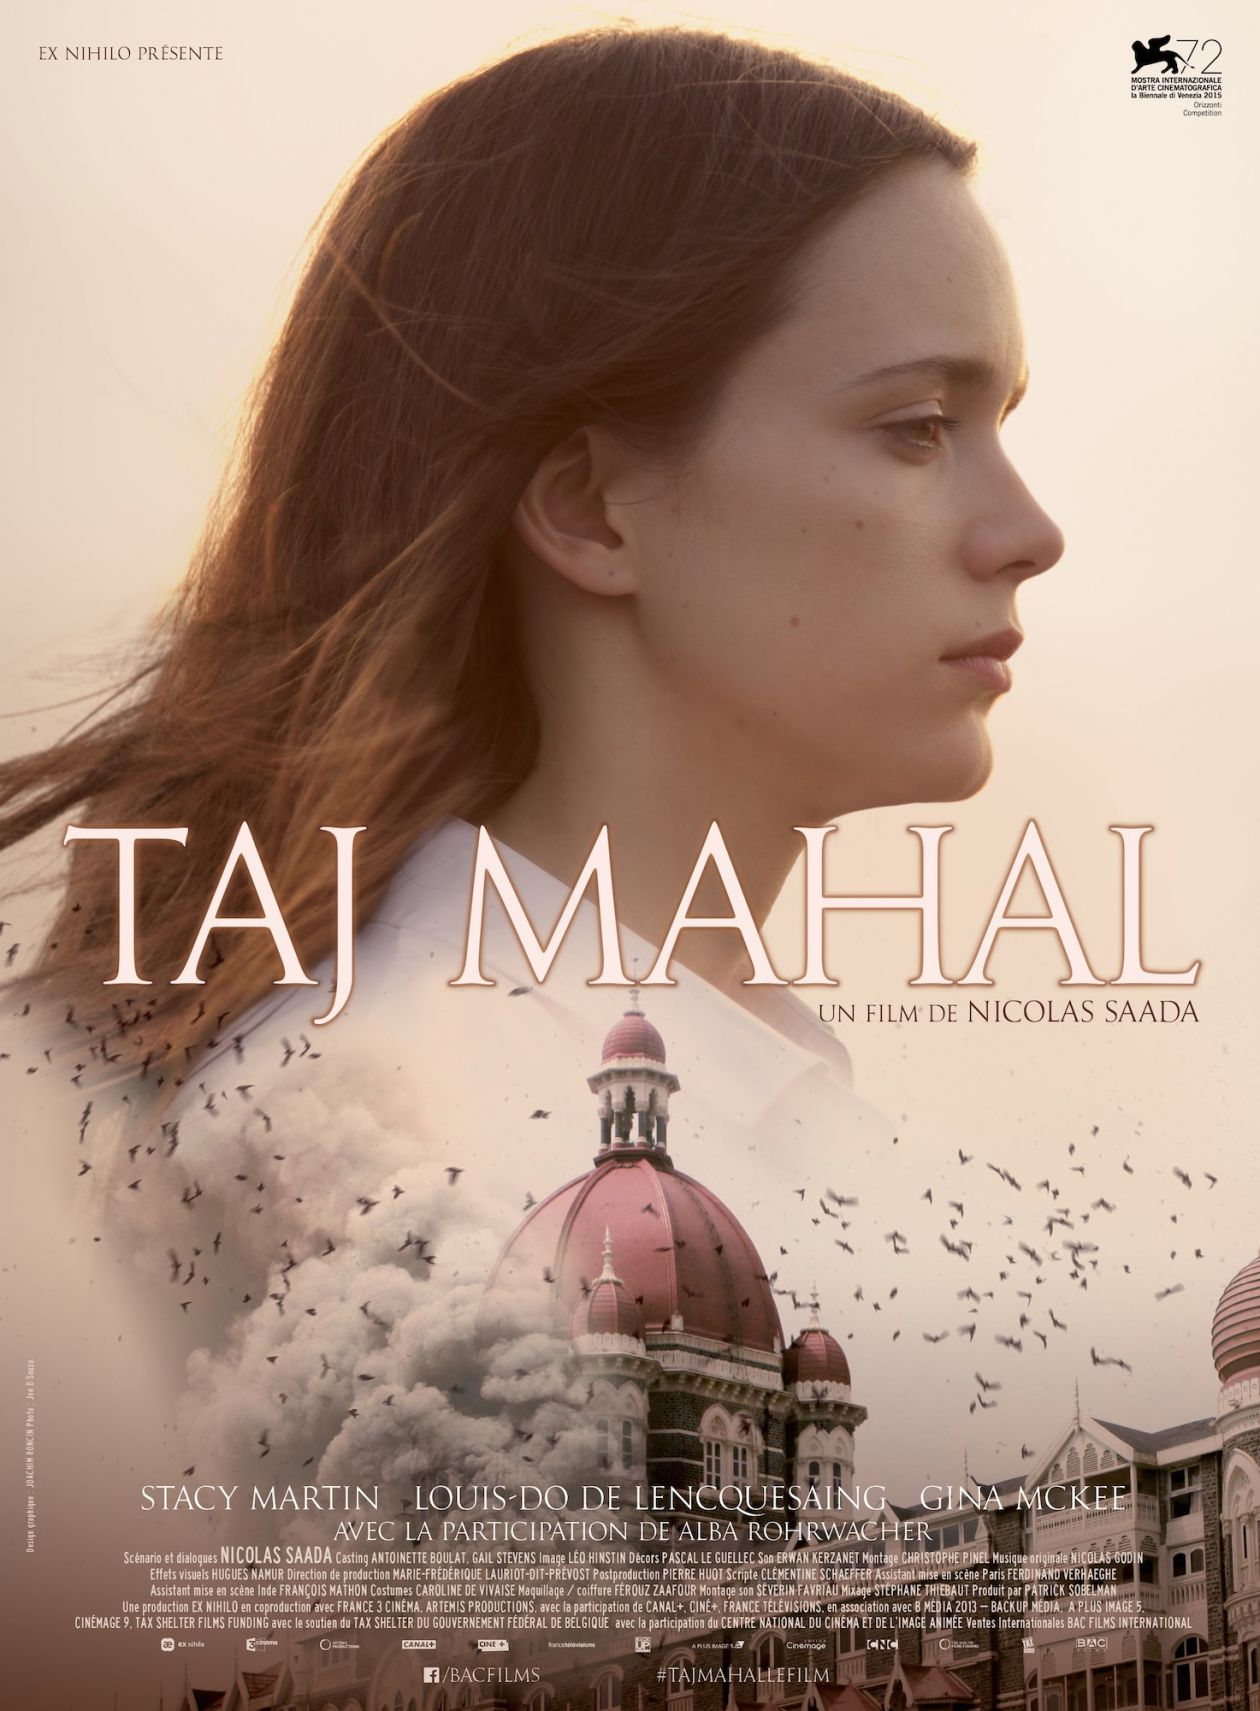 Stacy Martin   Taj Mahal   Nicolas Saada 2015 / MOVIE POSTER / AFFICHE DU FILM